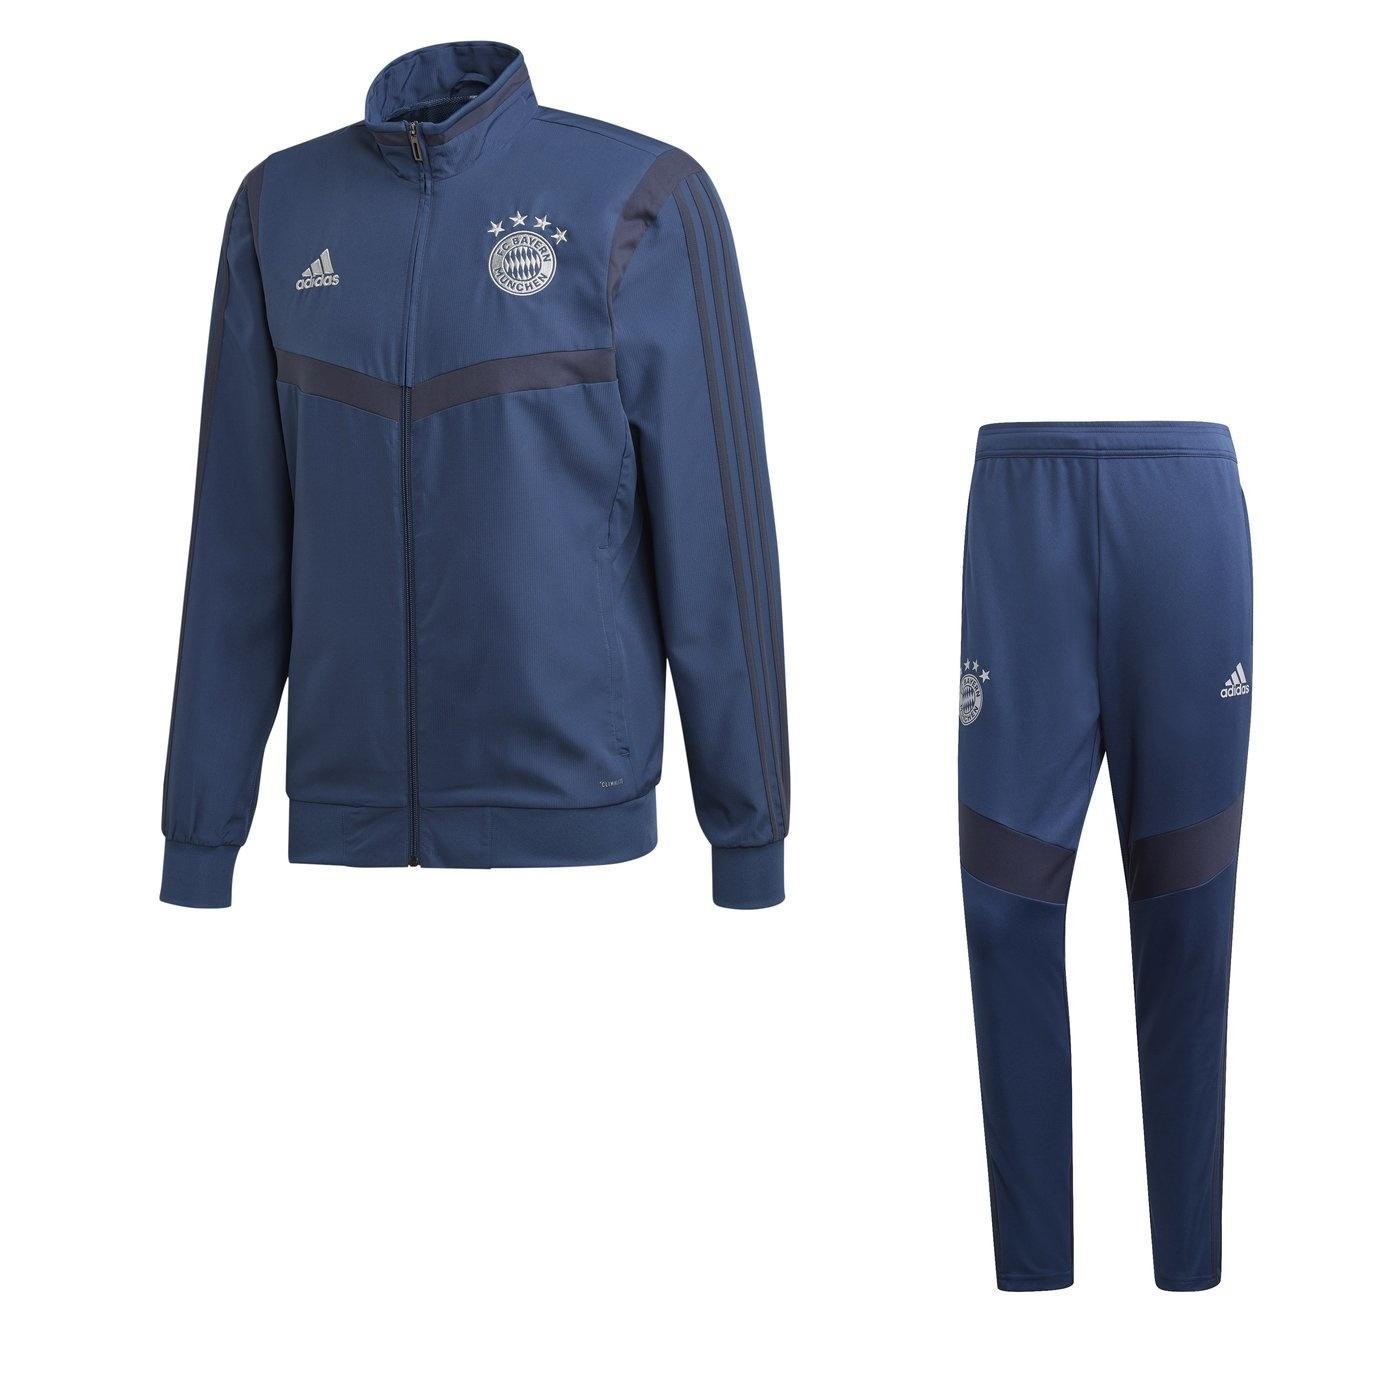 Adidas ADIDAS Bayern München Presentation Suit